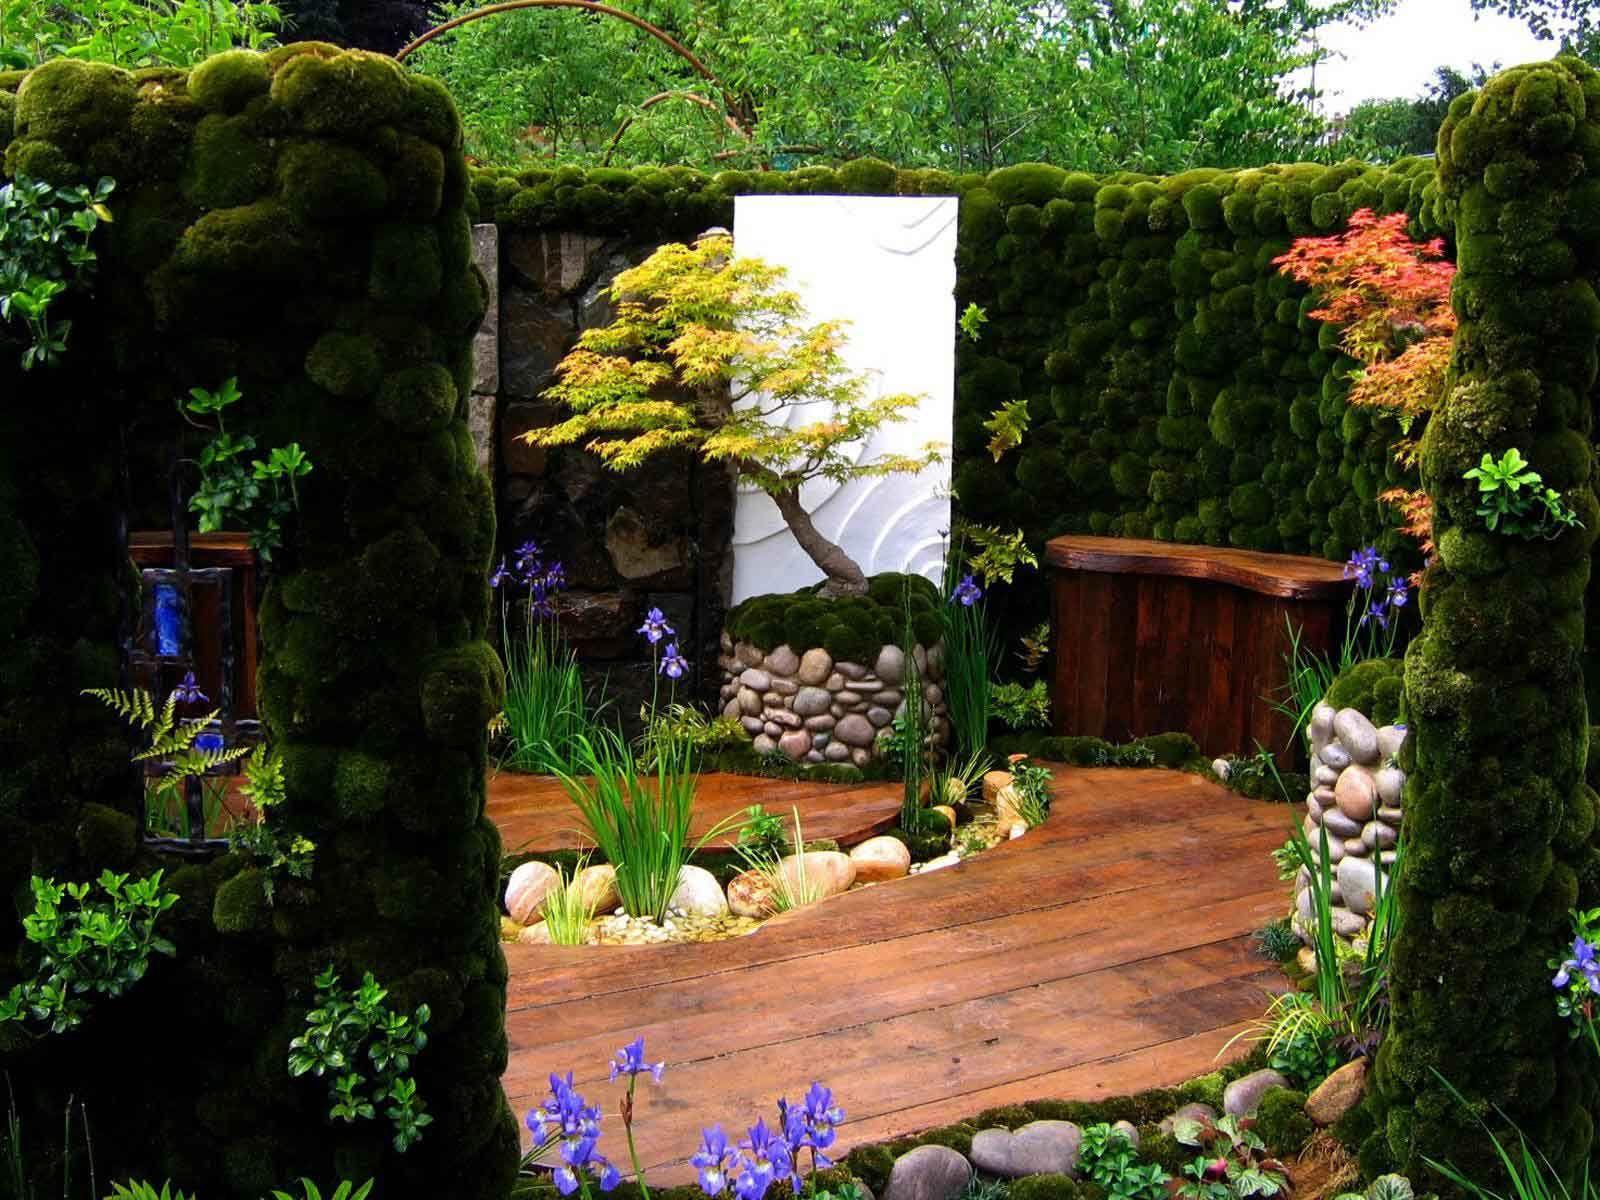 fotos paisajes de jardines plantas flores naturales imagenes